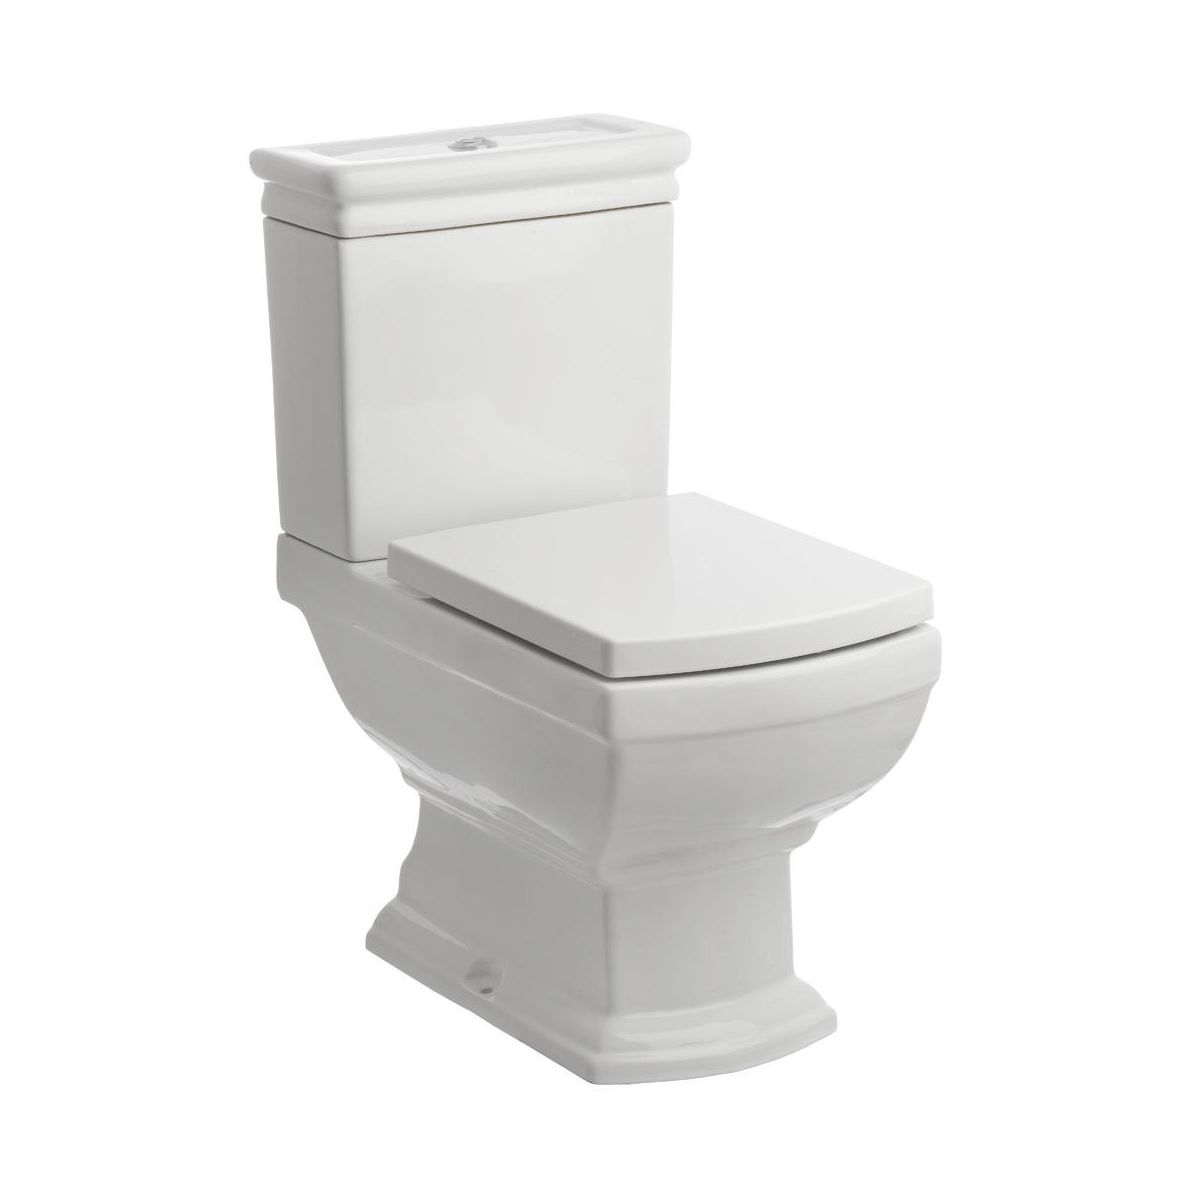 Wc kompakt kleopatra odp yw poziomy kerra wc kompakty - Accessoires wc leroy merlin ...